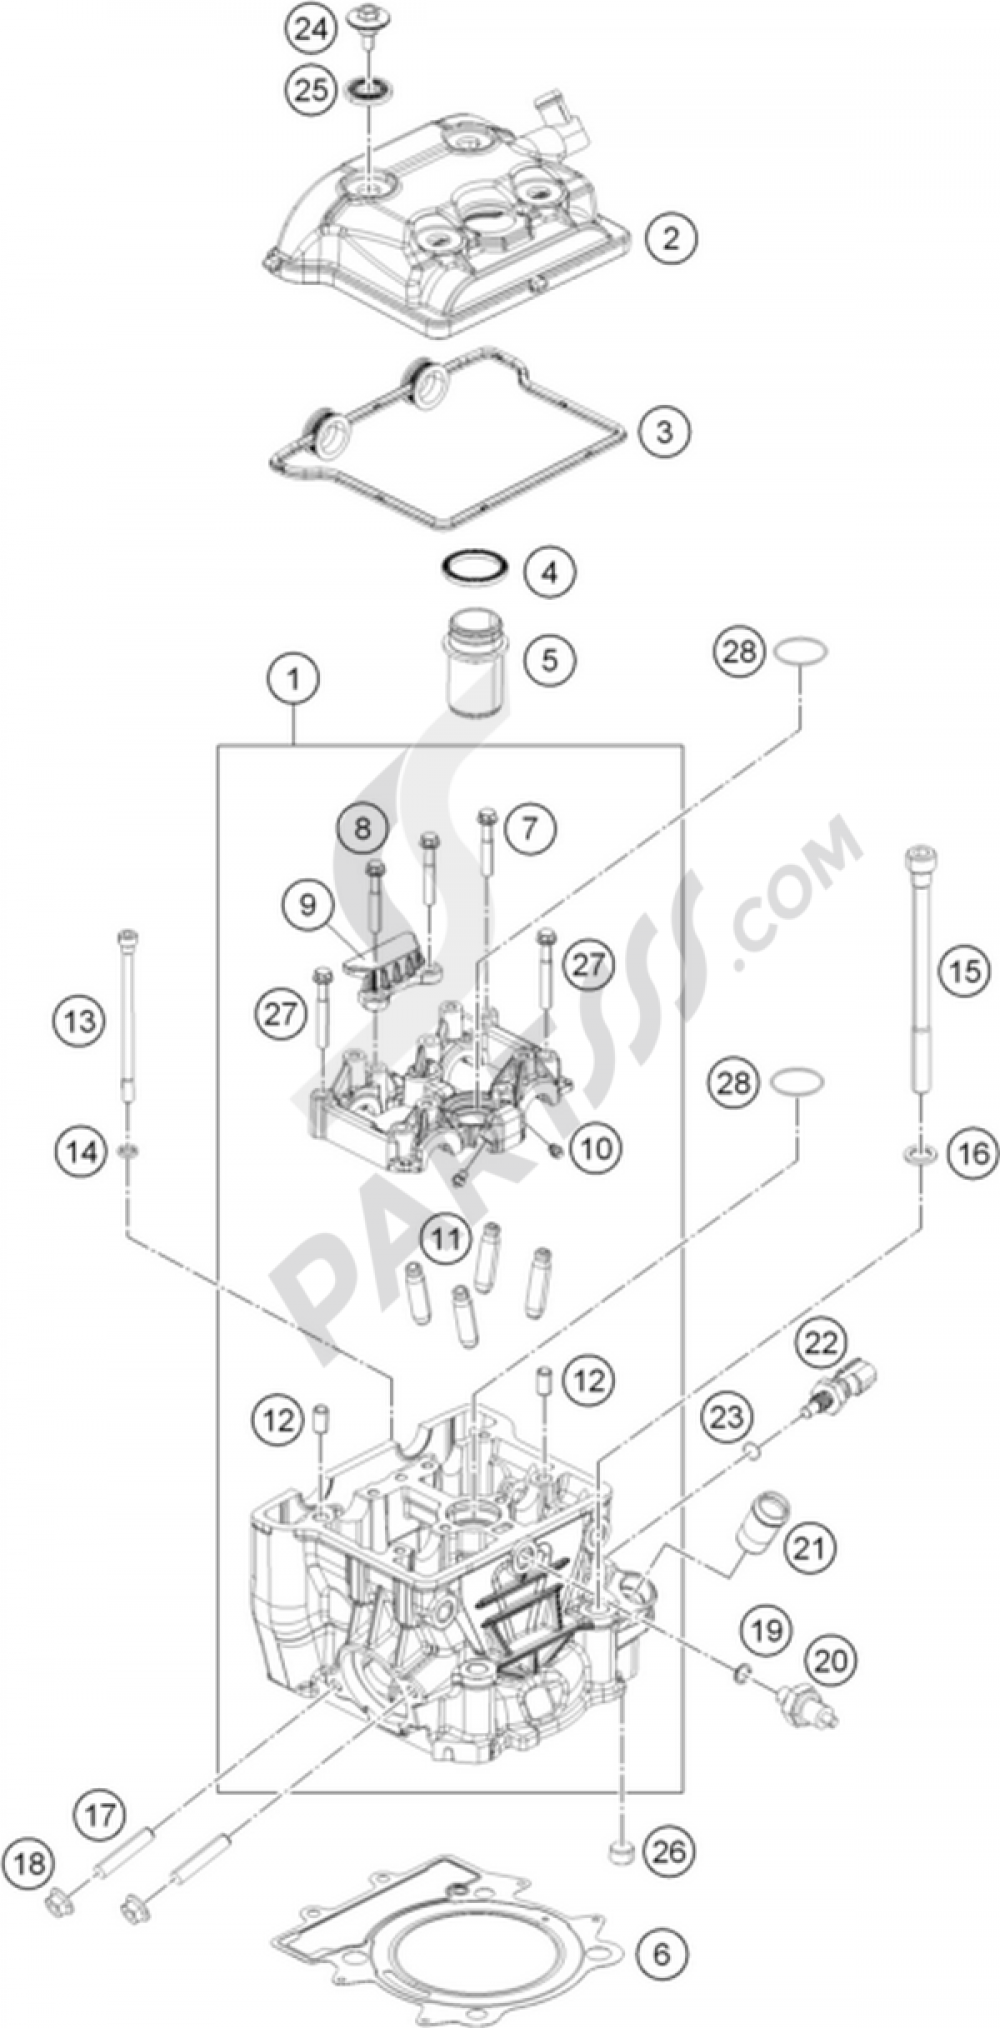 ktm rc 390 wiring diagram